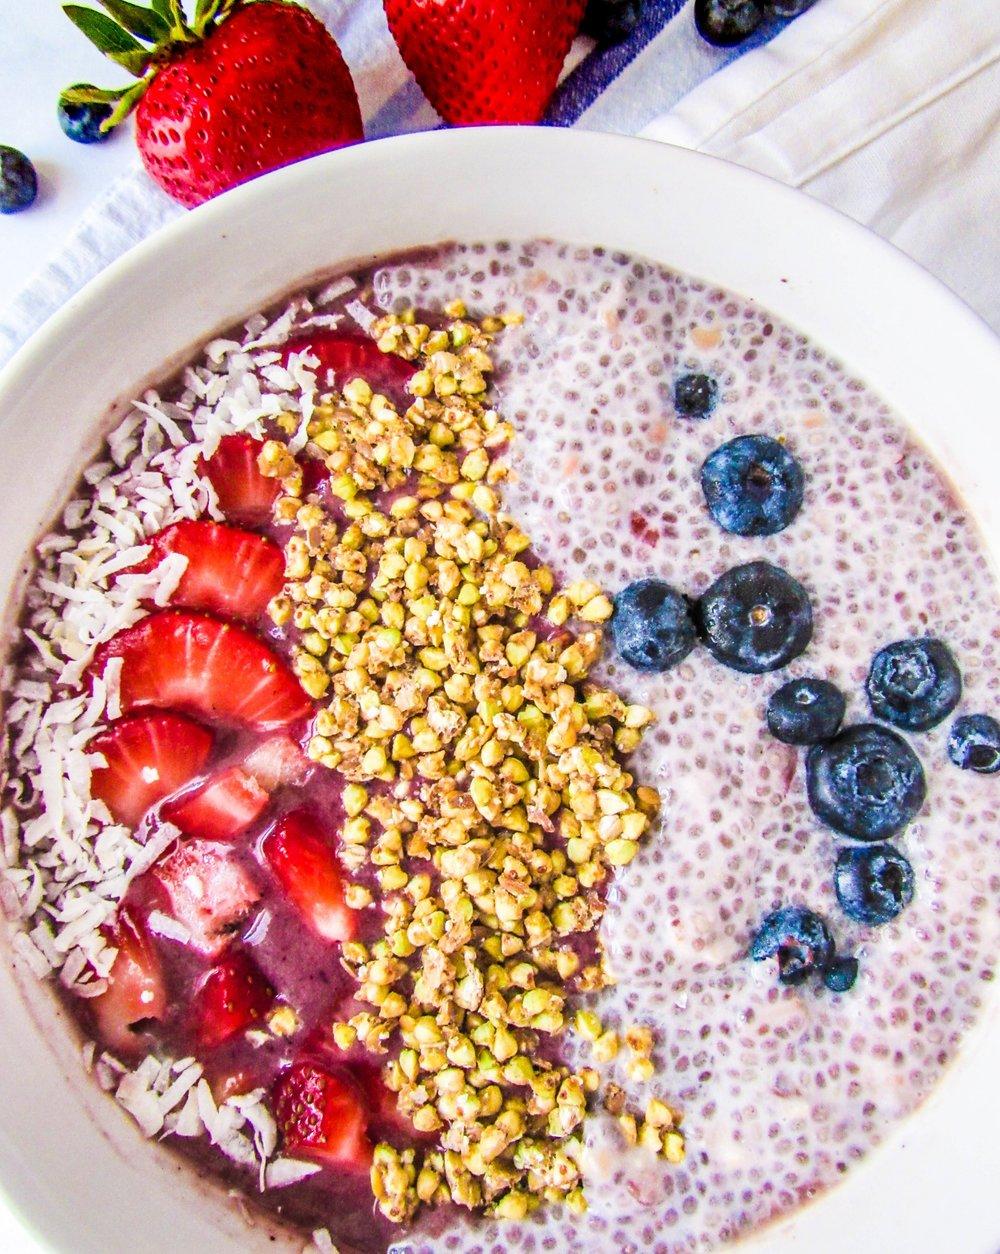 We <3 Acai - Acai is full of vitamin C, antioxidants, fiber, & is low in sugar!